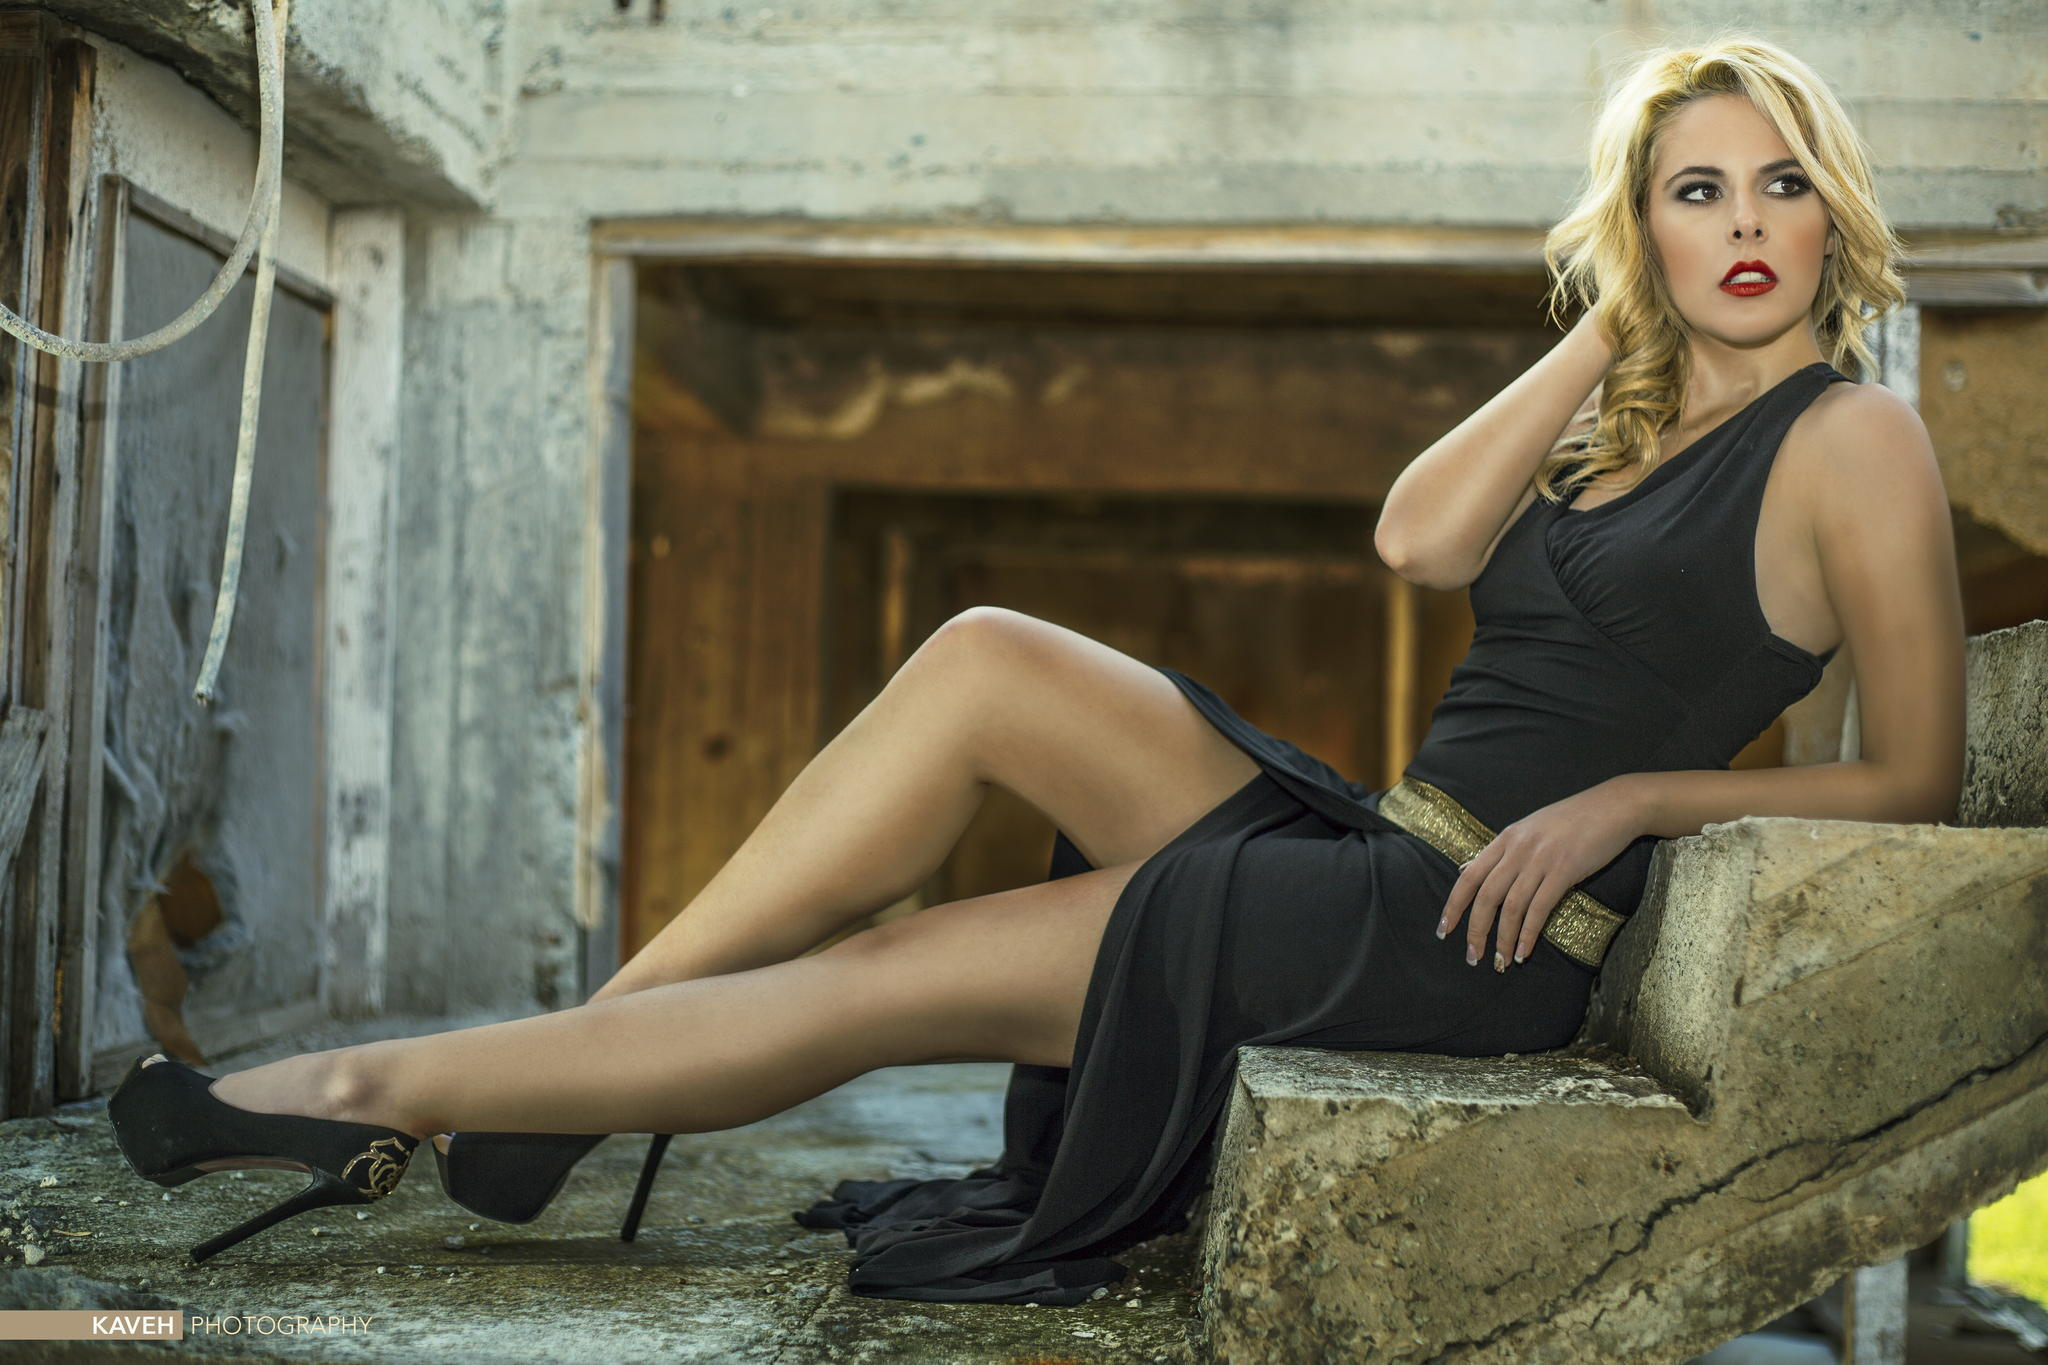 Xra wollpapr women 3gp sexy gallery